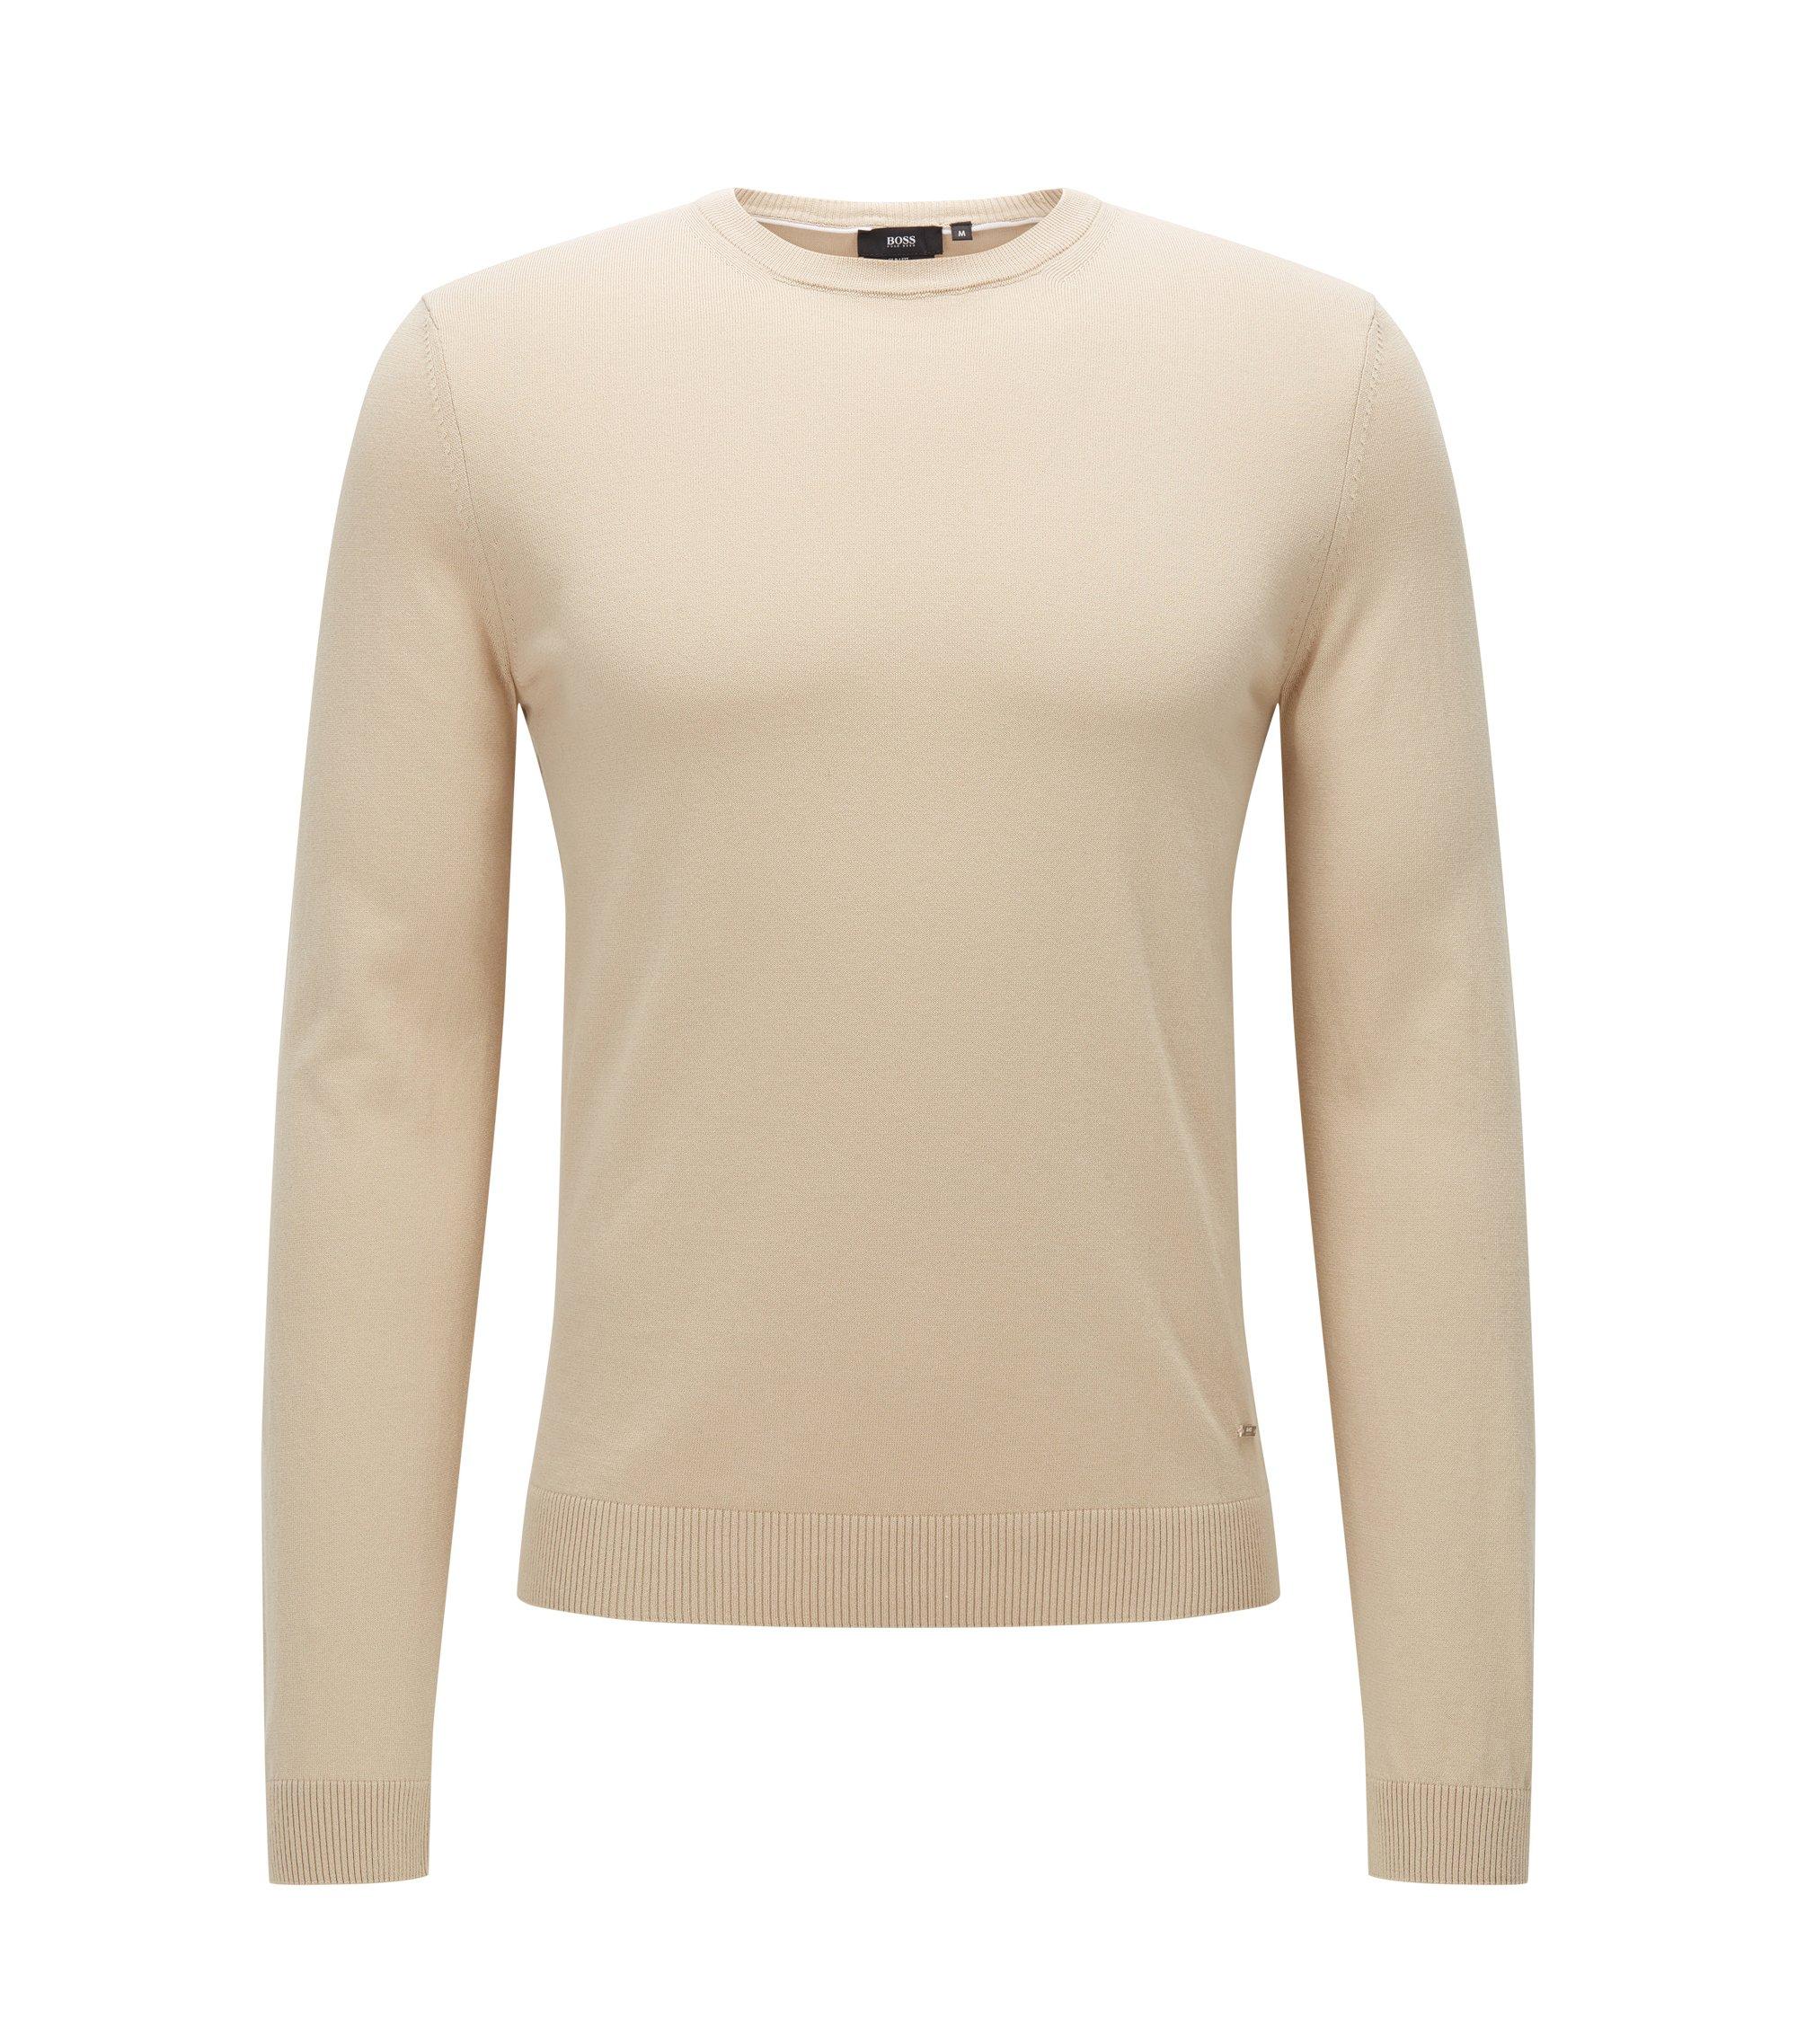 'Fabello O' | Cotton Sweater, Light Beige